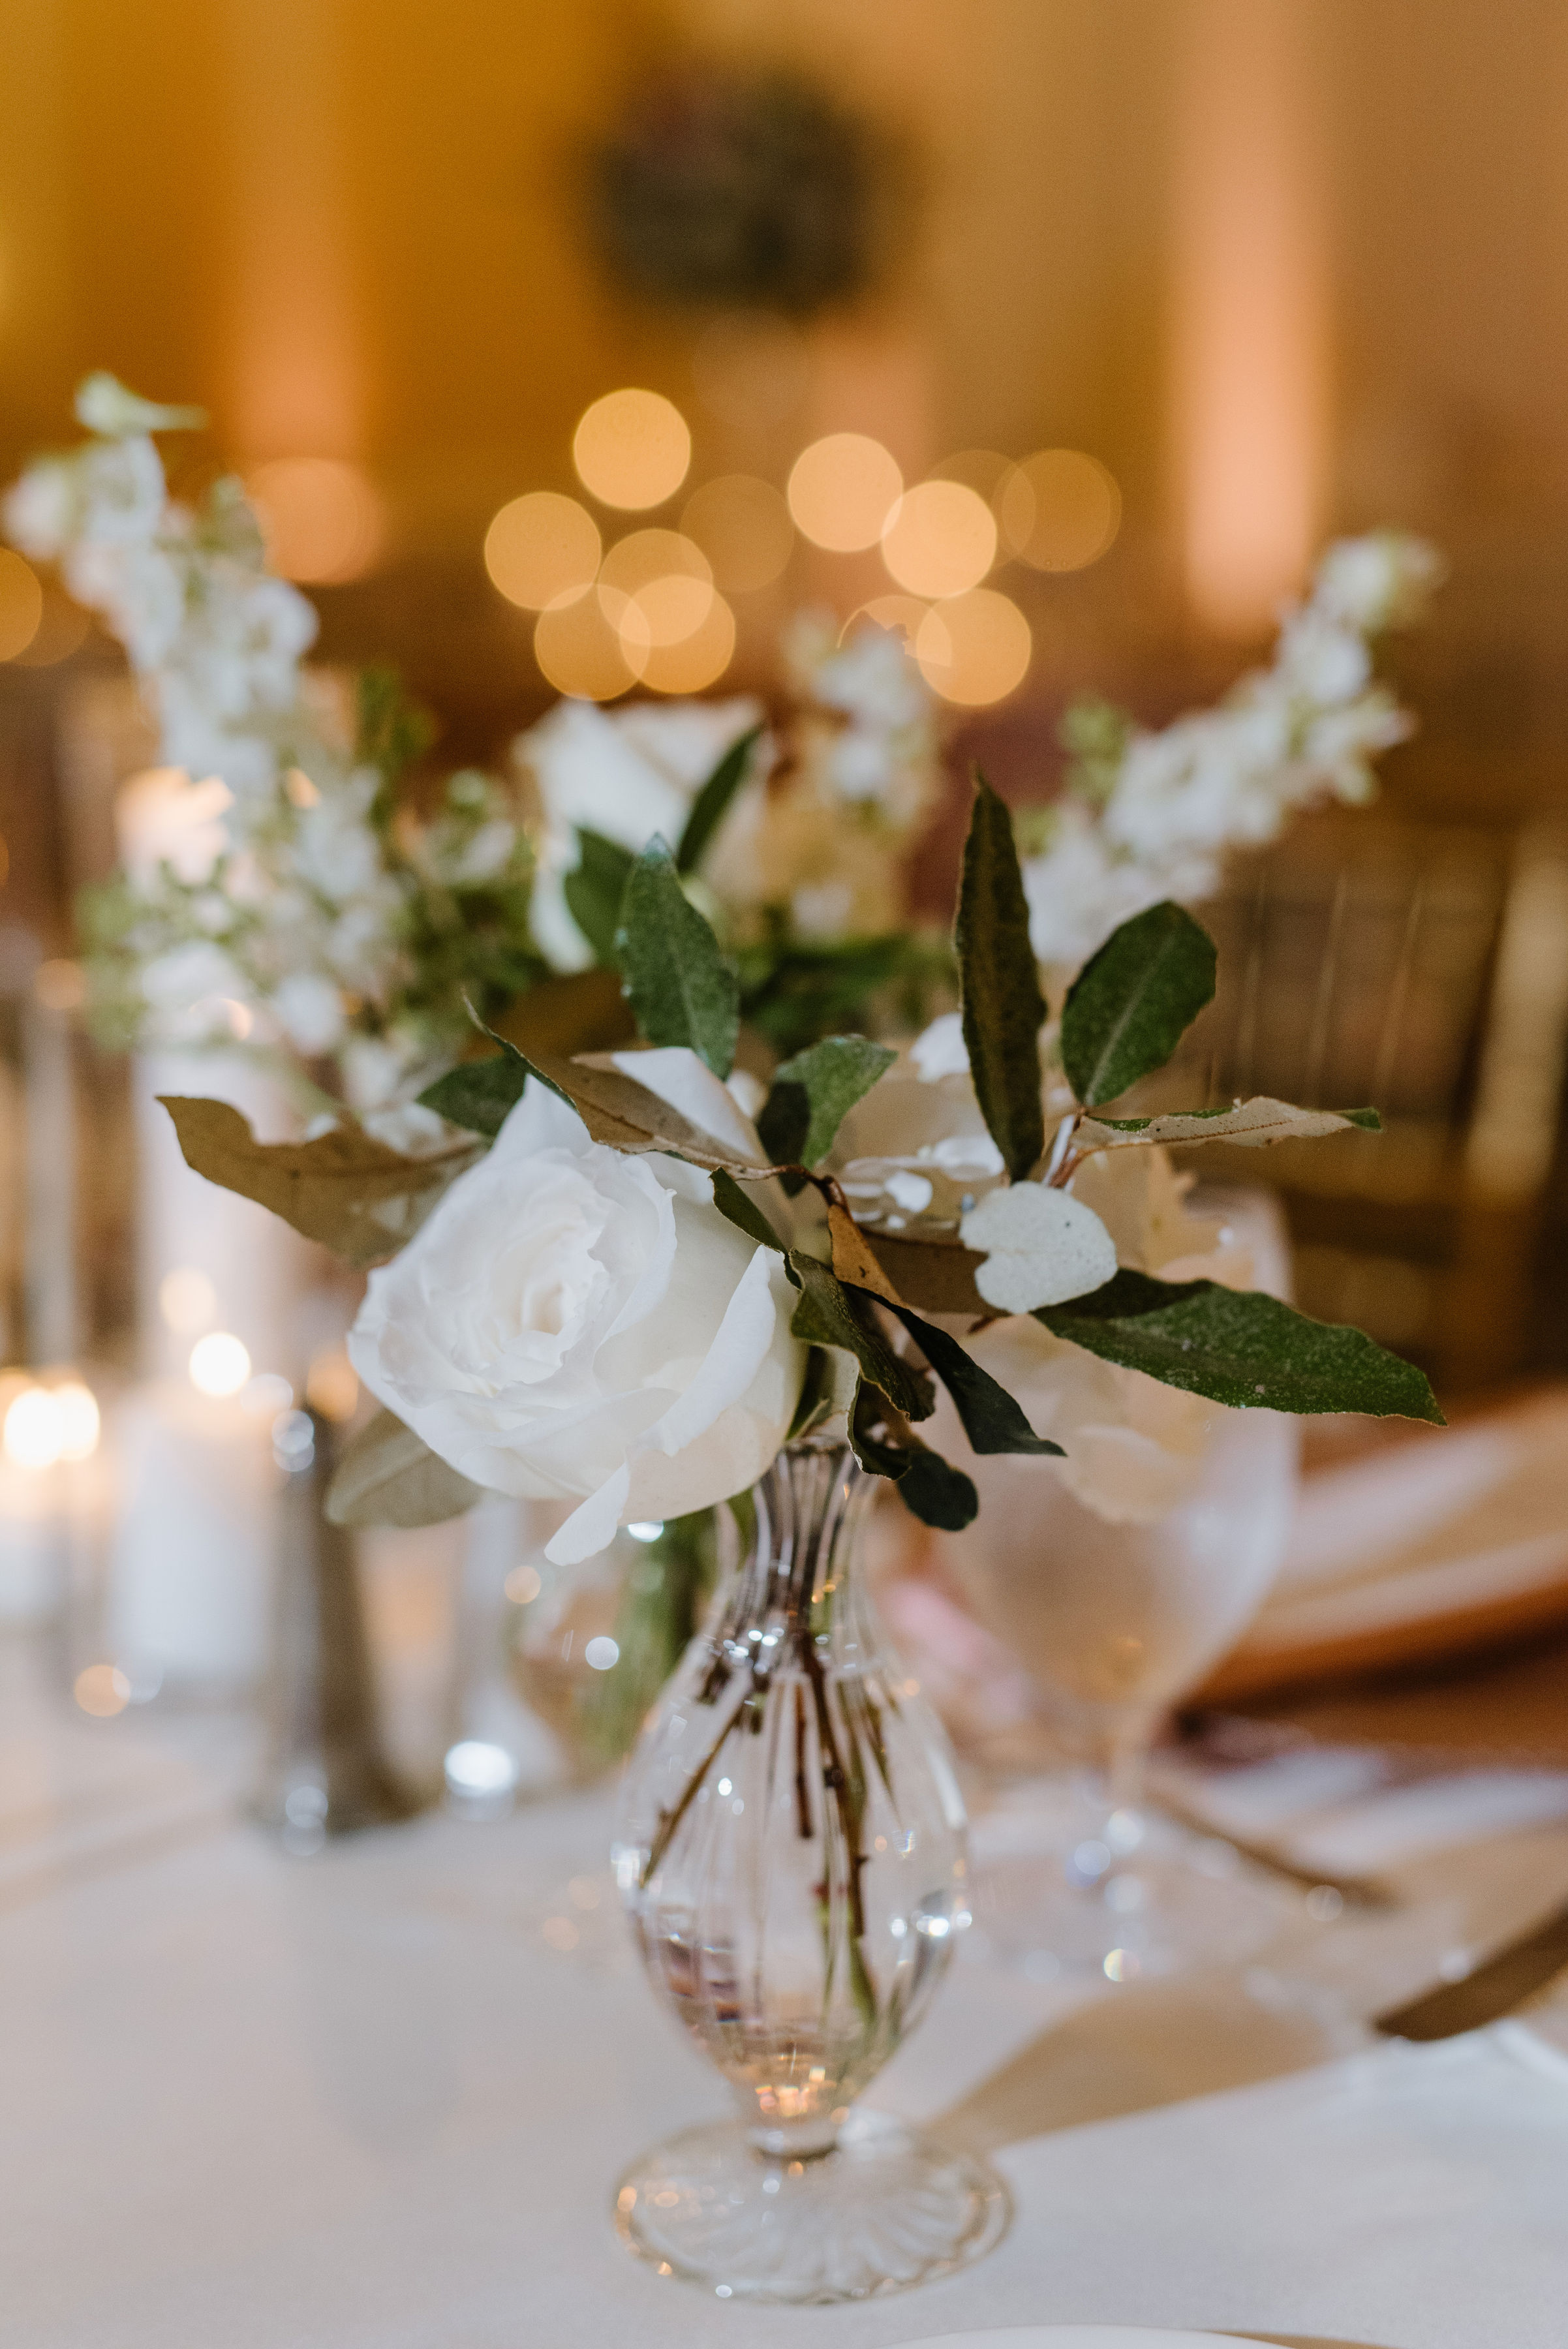 McElravey_Wedding_CarolineLimaPhotography_2018_310.jpg